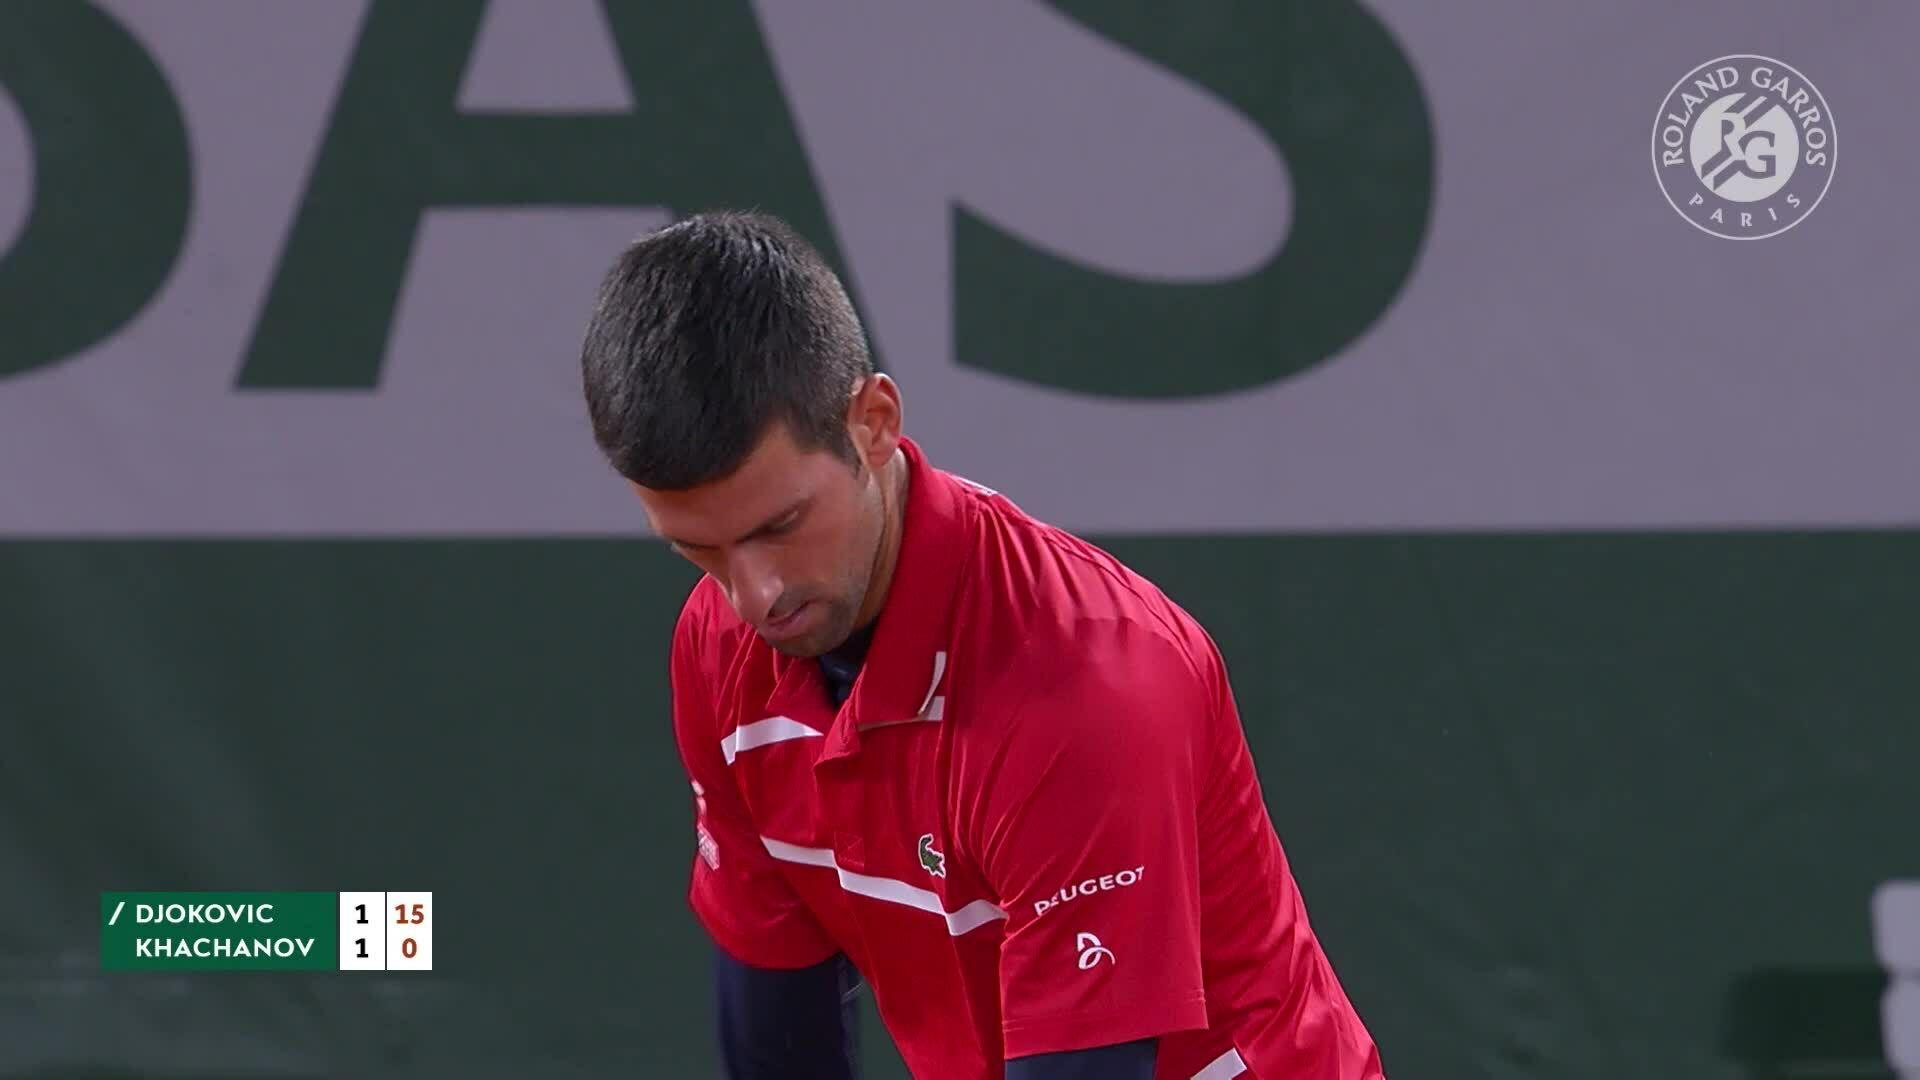 Novak Djokovic 3-0 Karen Khachanov